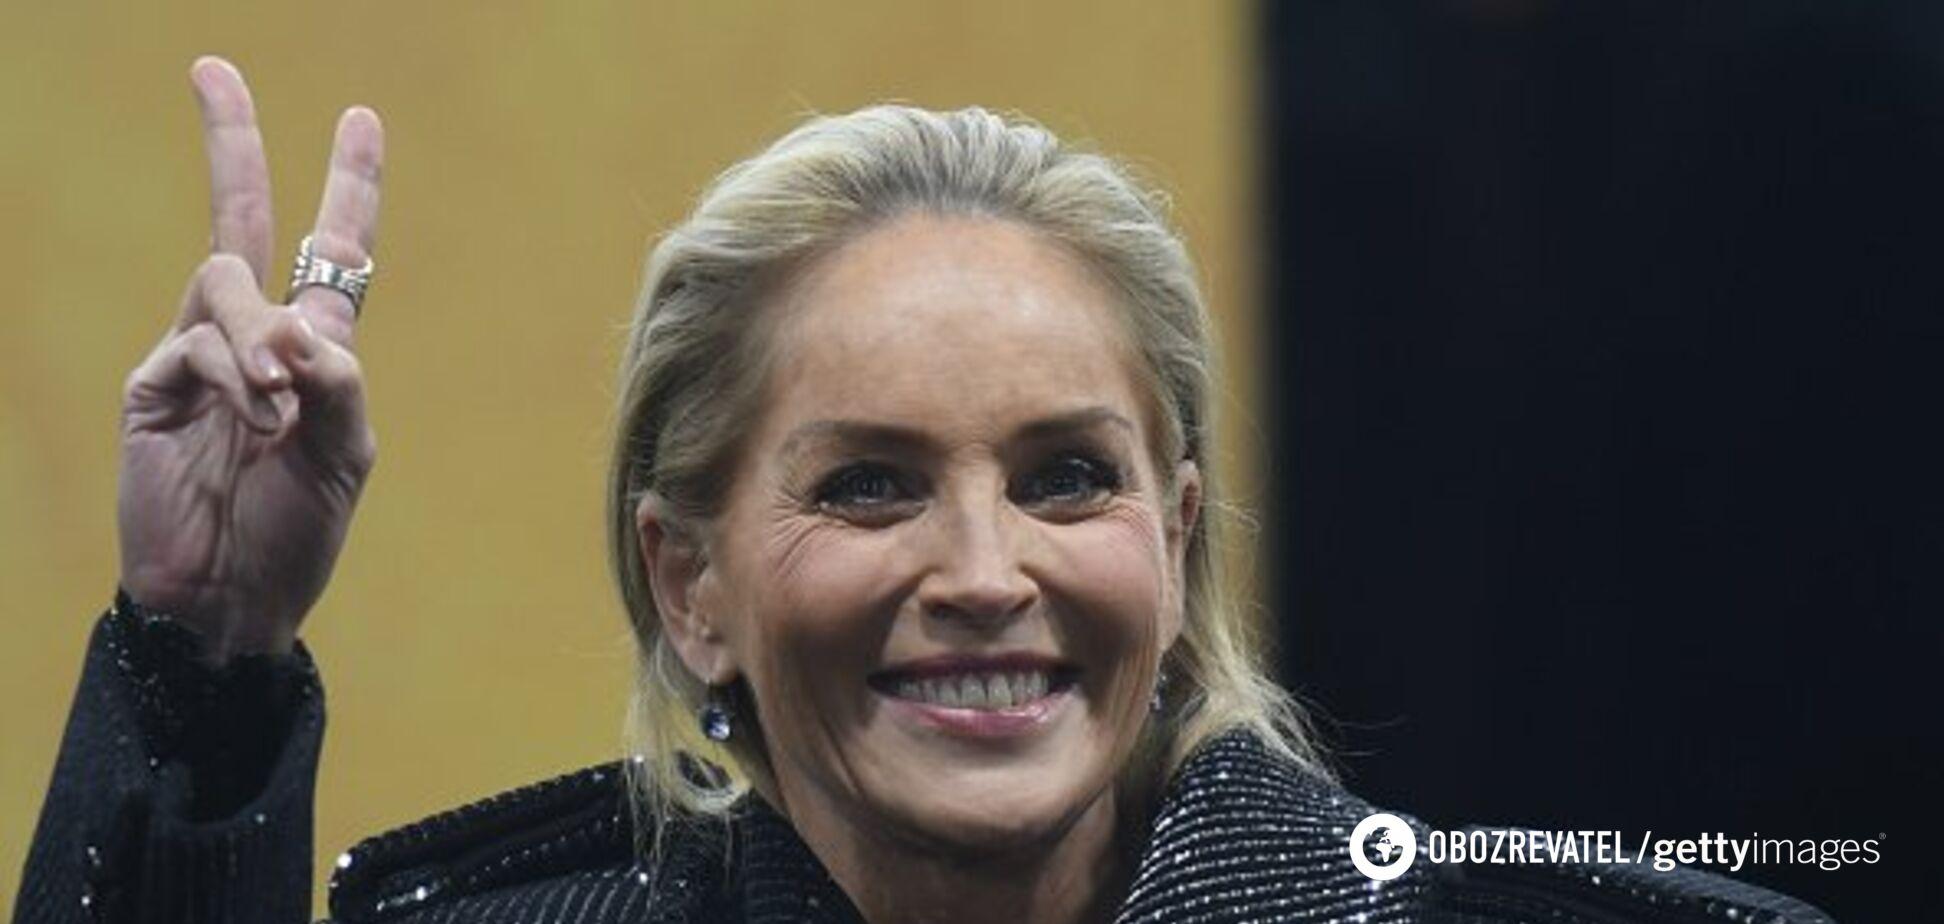 Без лифчика и макияжа: 61-летнюю Шэрон Стоун застукали в салоне красоты